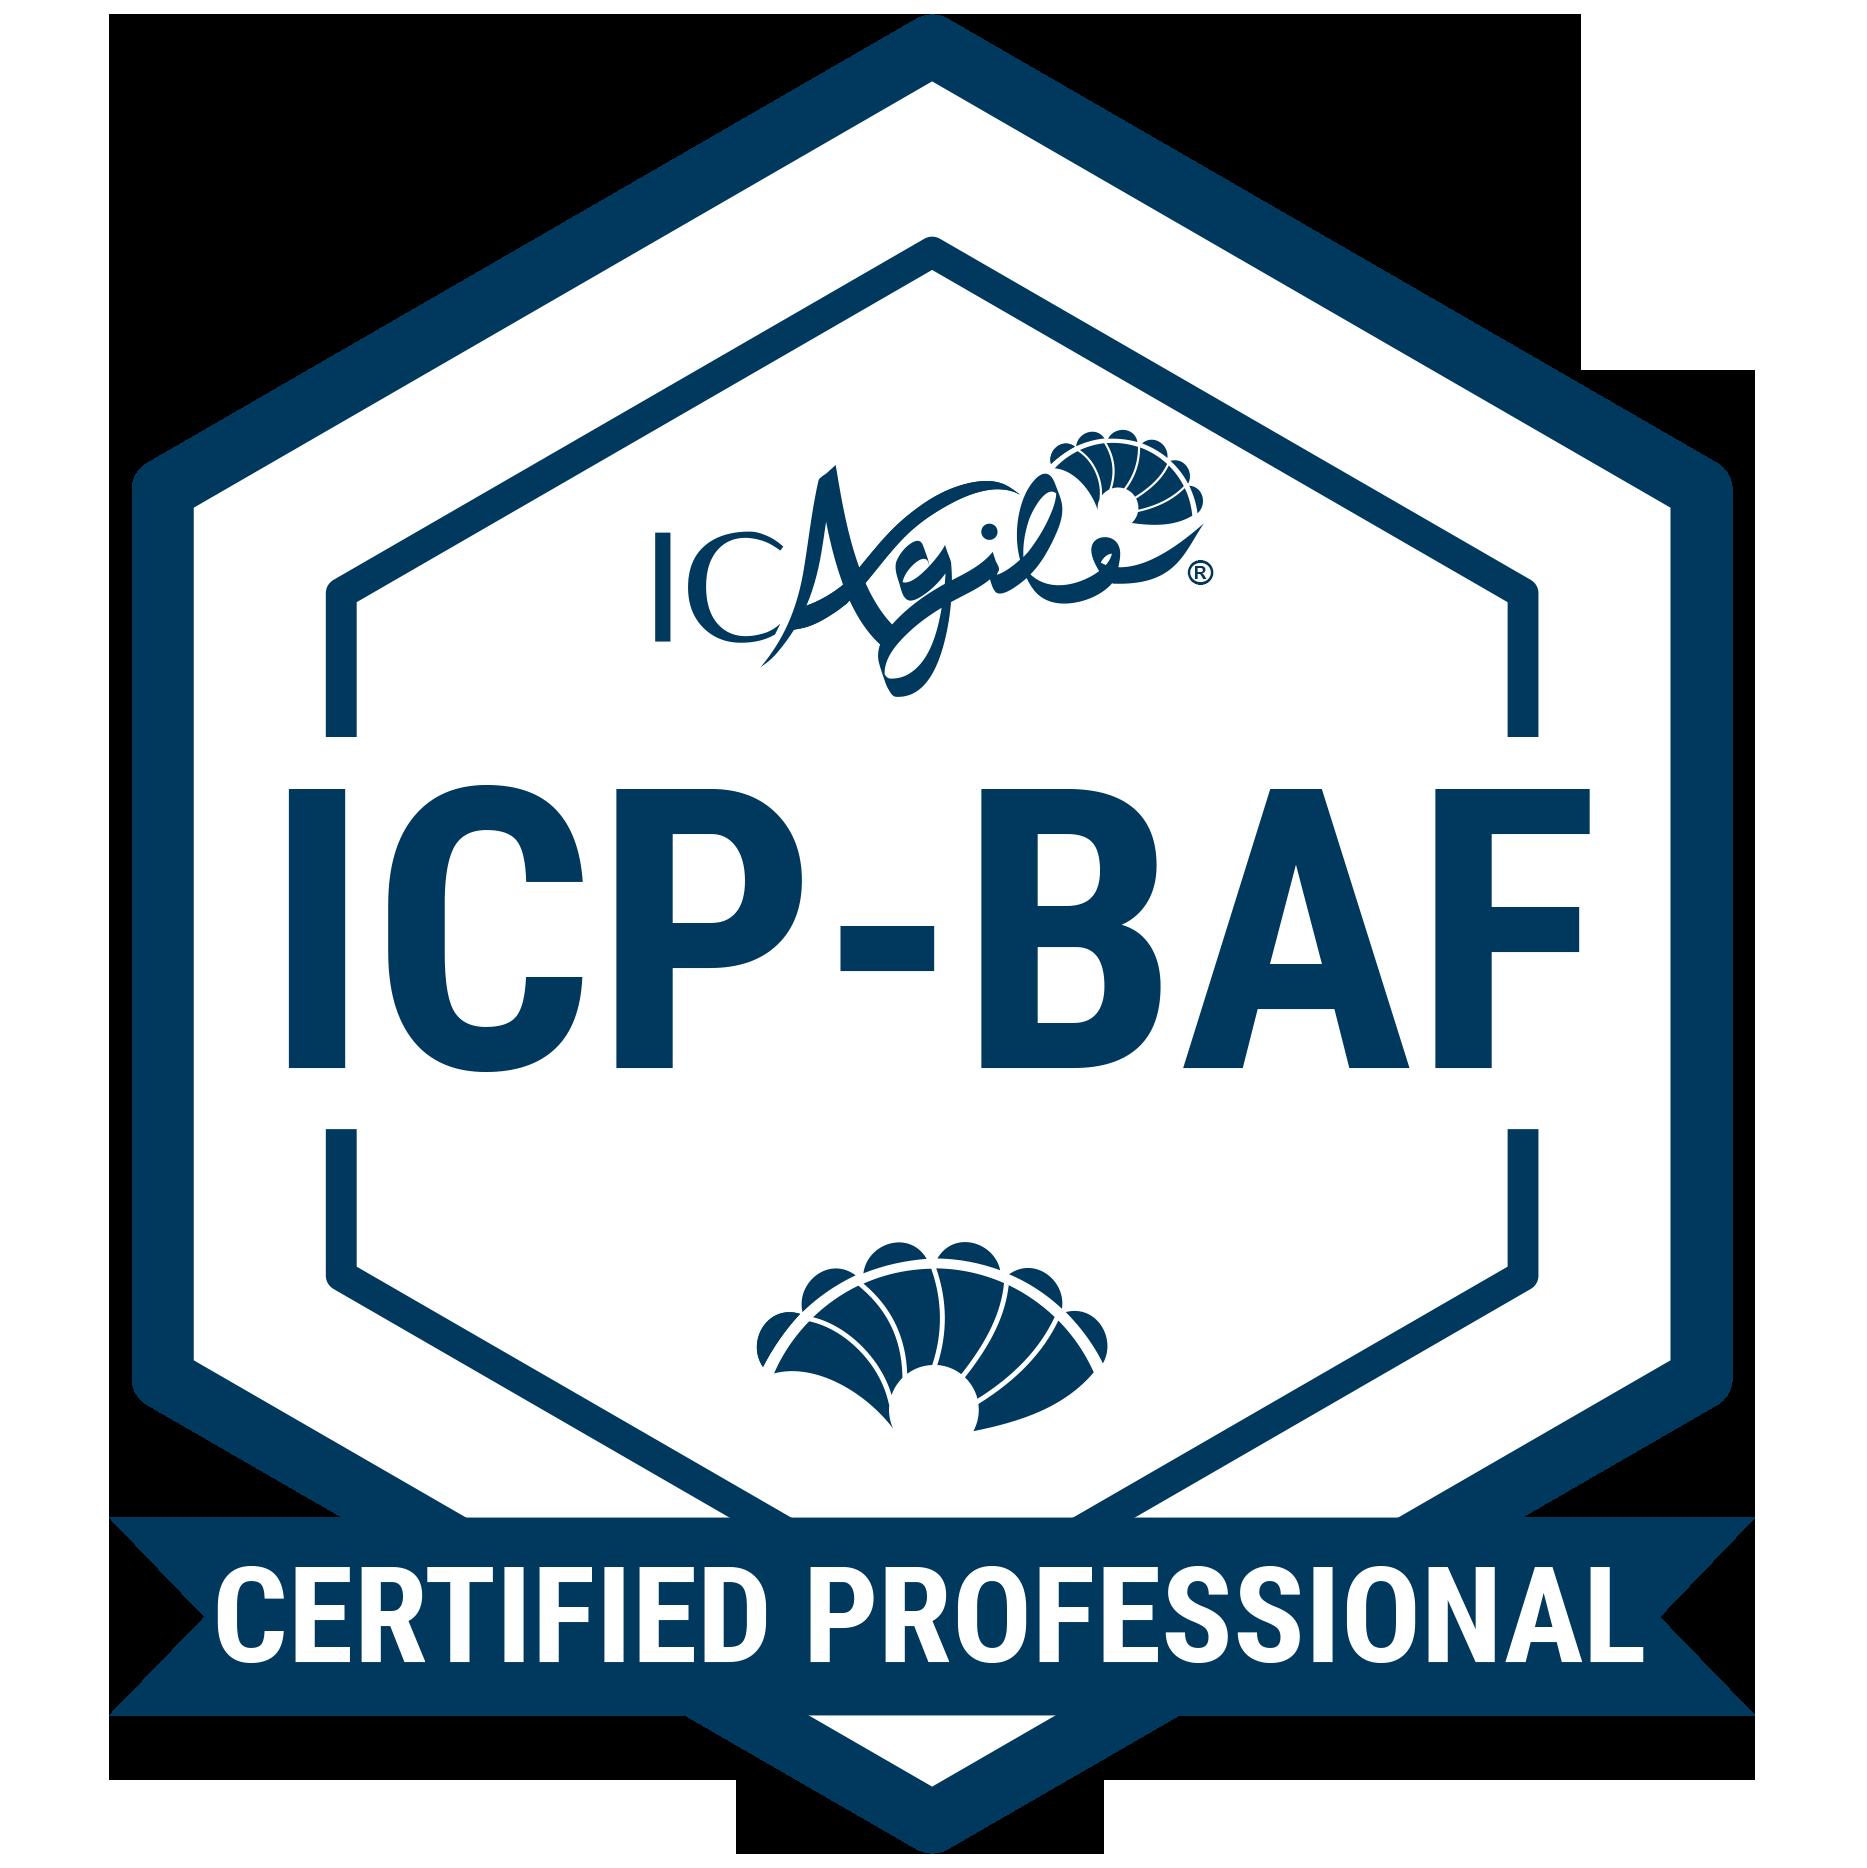 ICP-BAF badge